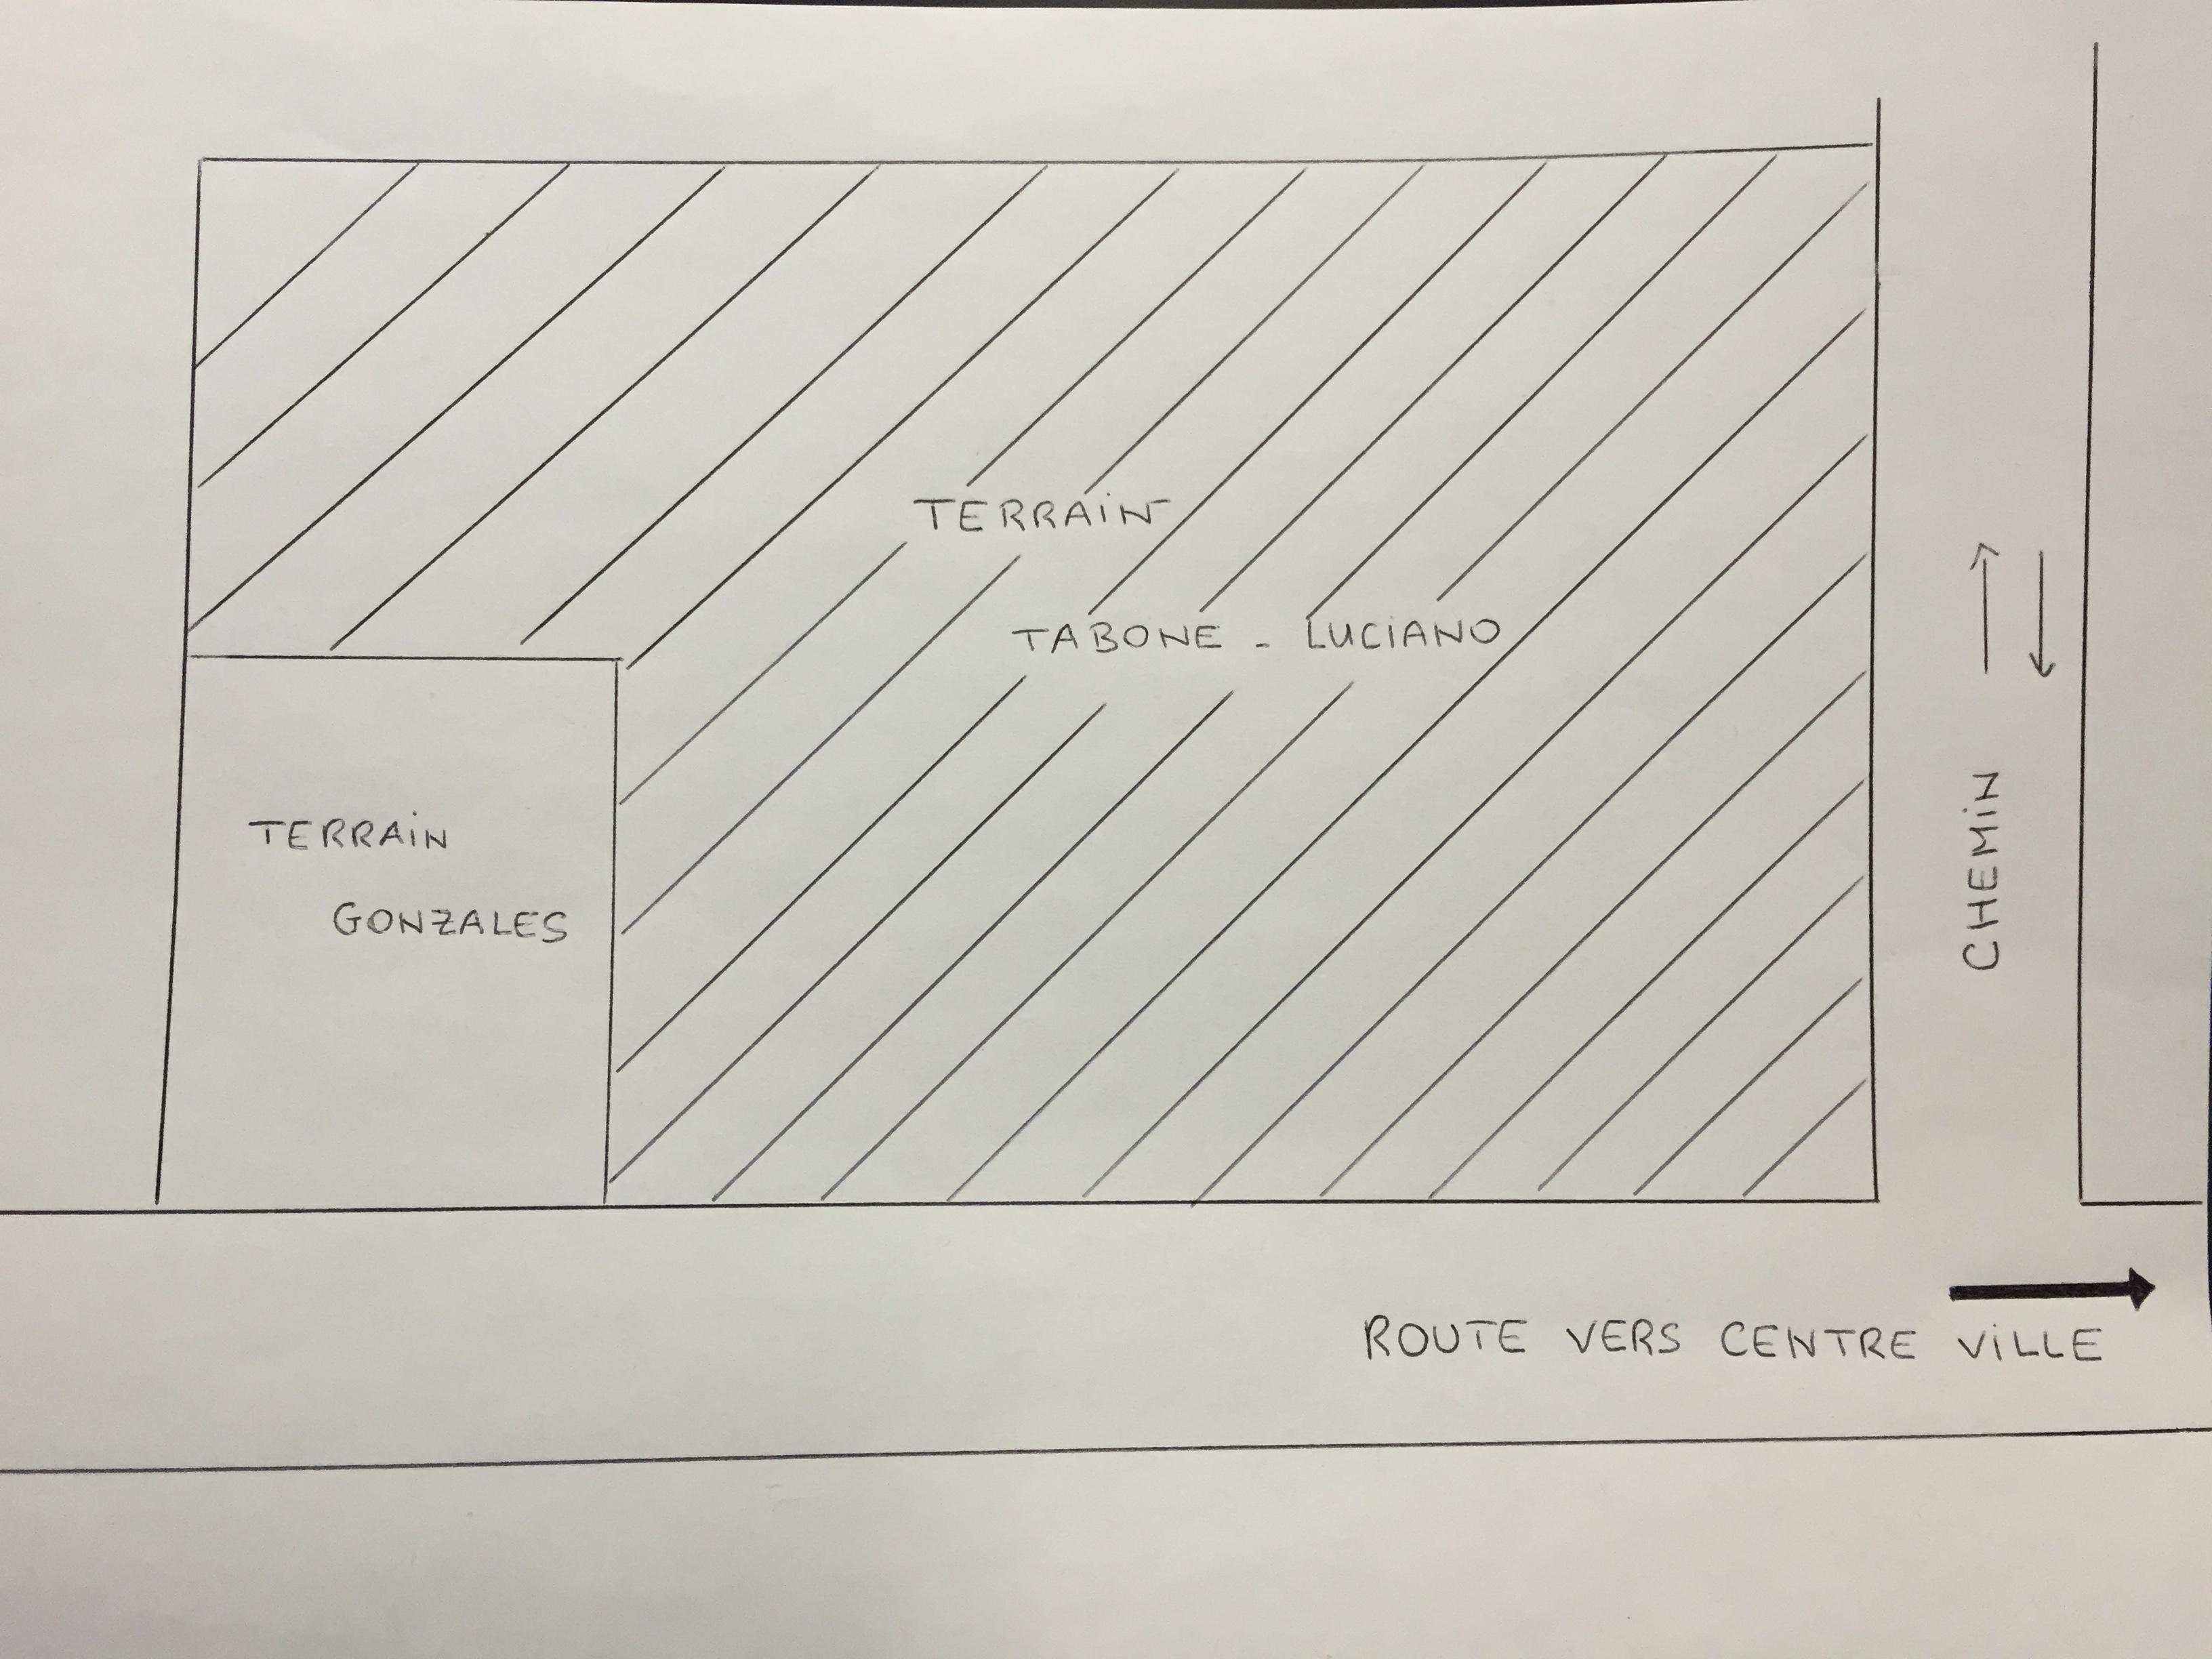 Configuration du terrain TABONE_LUCIANO